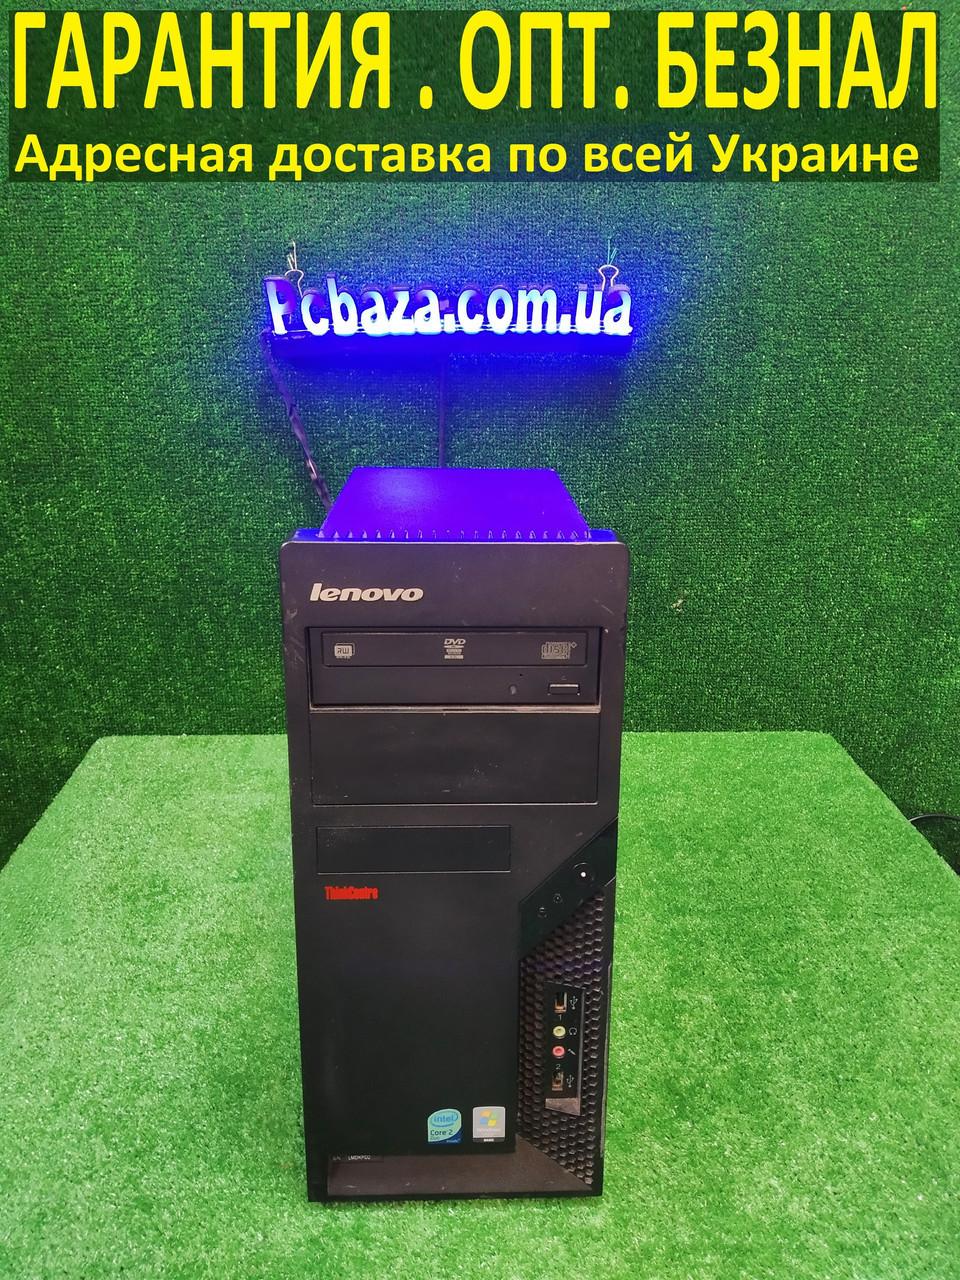 Компьютер Lenovo M55 Intel 4 ядра, 8GB ОЗУ, 500GB HDD, Настроен и готов к работе!